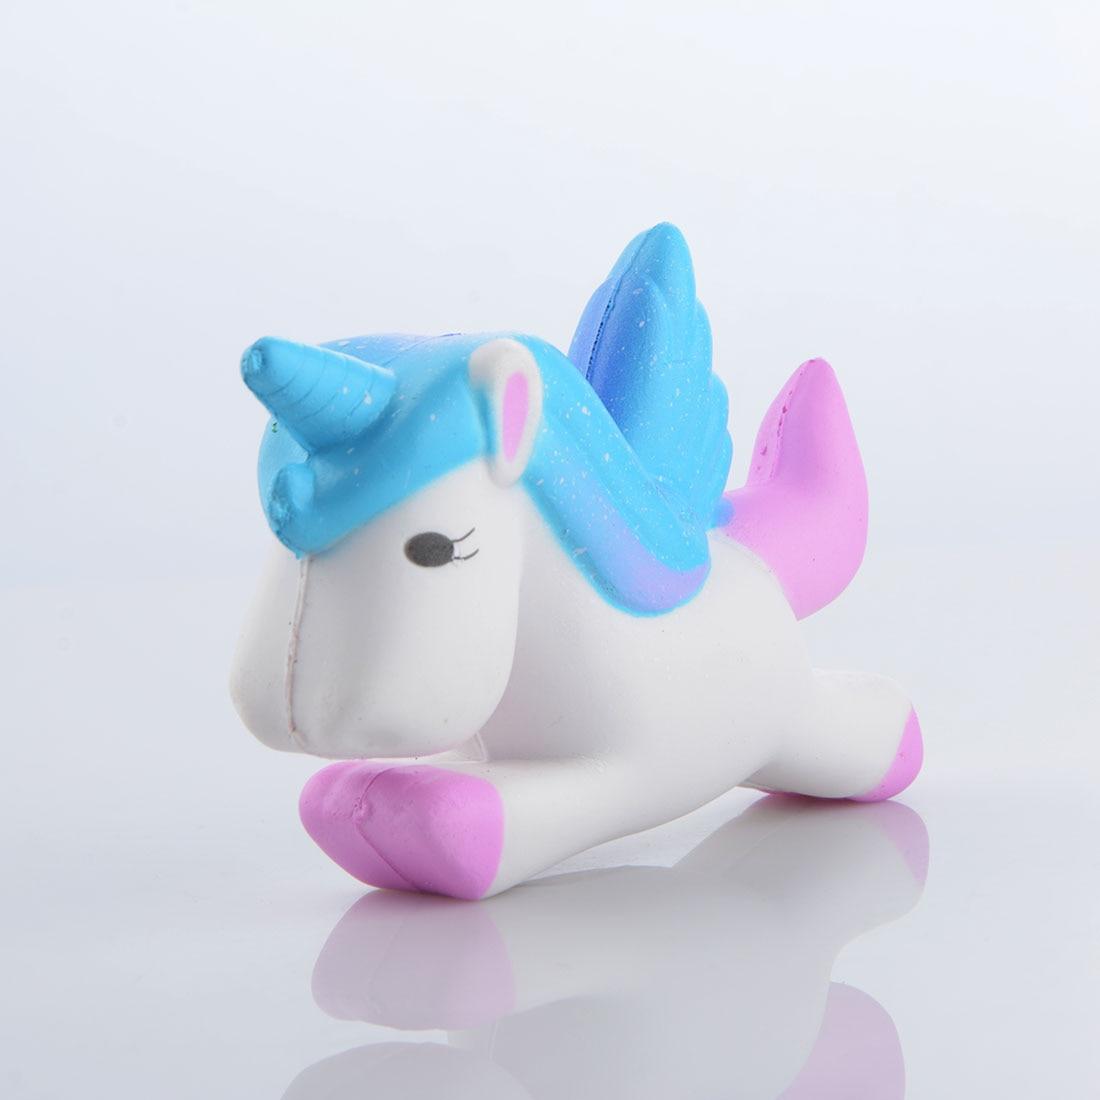 Squishy Toys Pony : Rainbow Flying Unicorn Horse Squishy Toys Slow Rising Squeeze Pony Doll Fun Jokes Props Phone ...